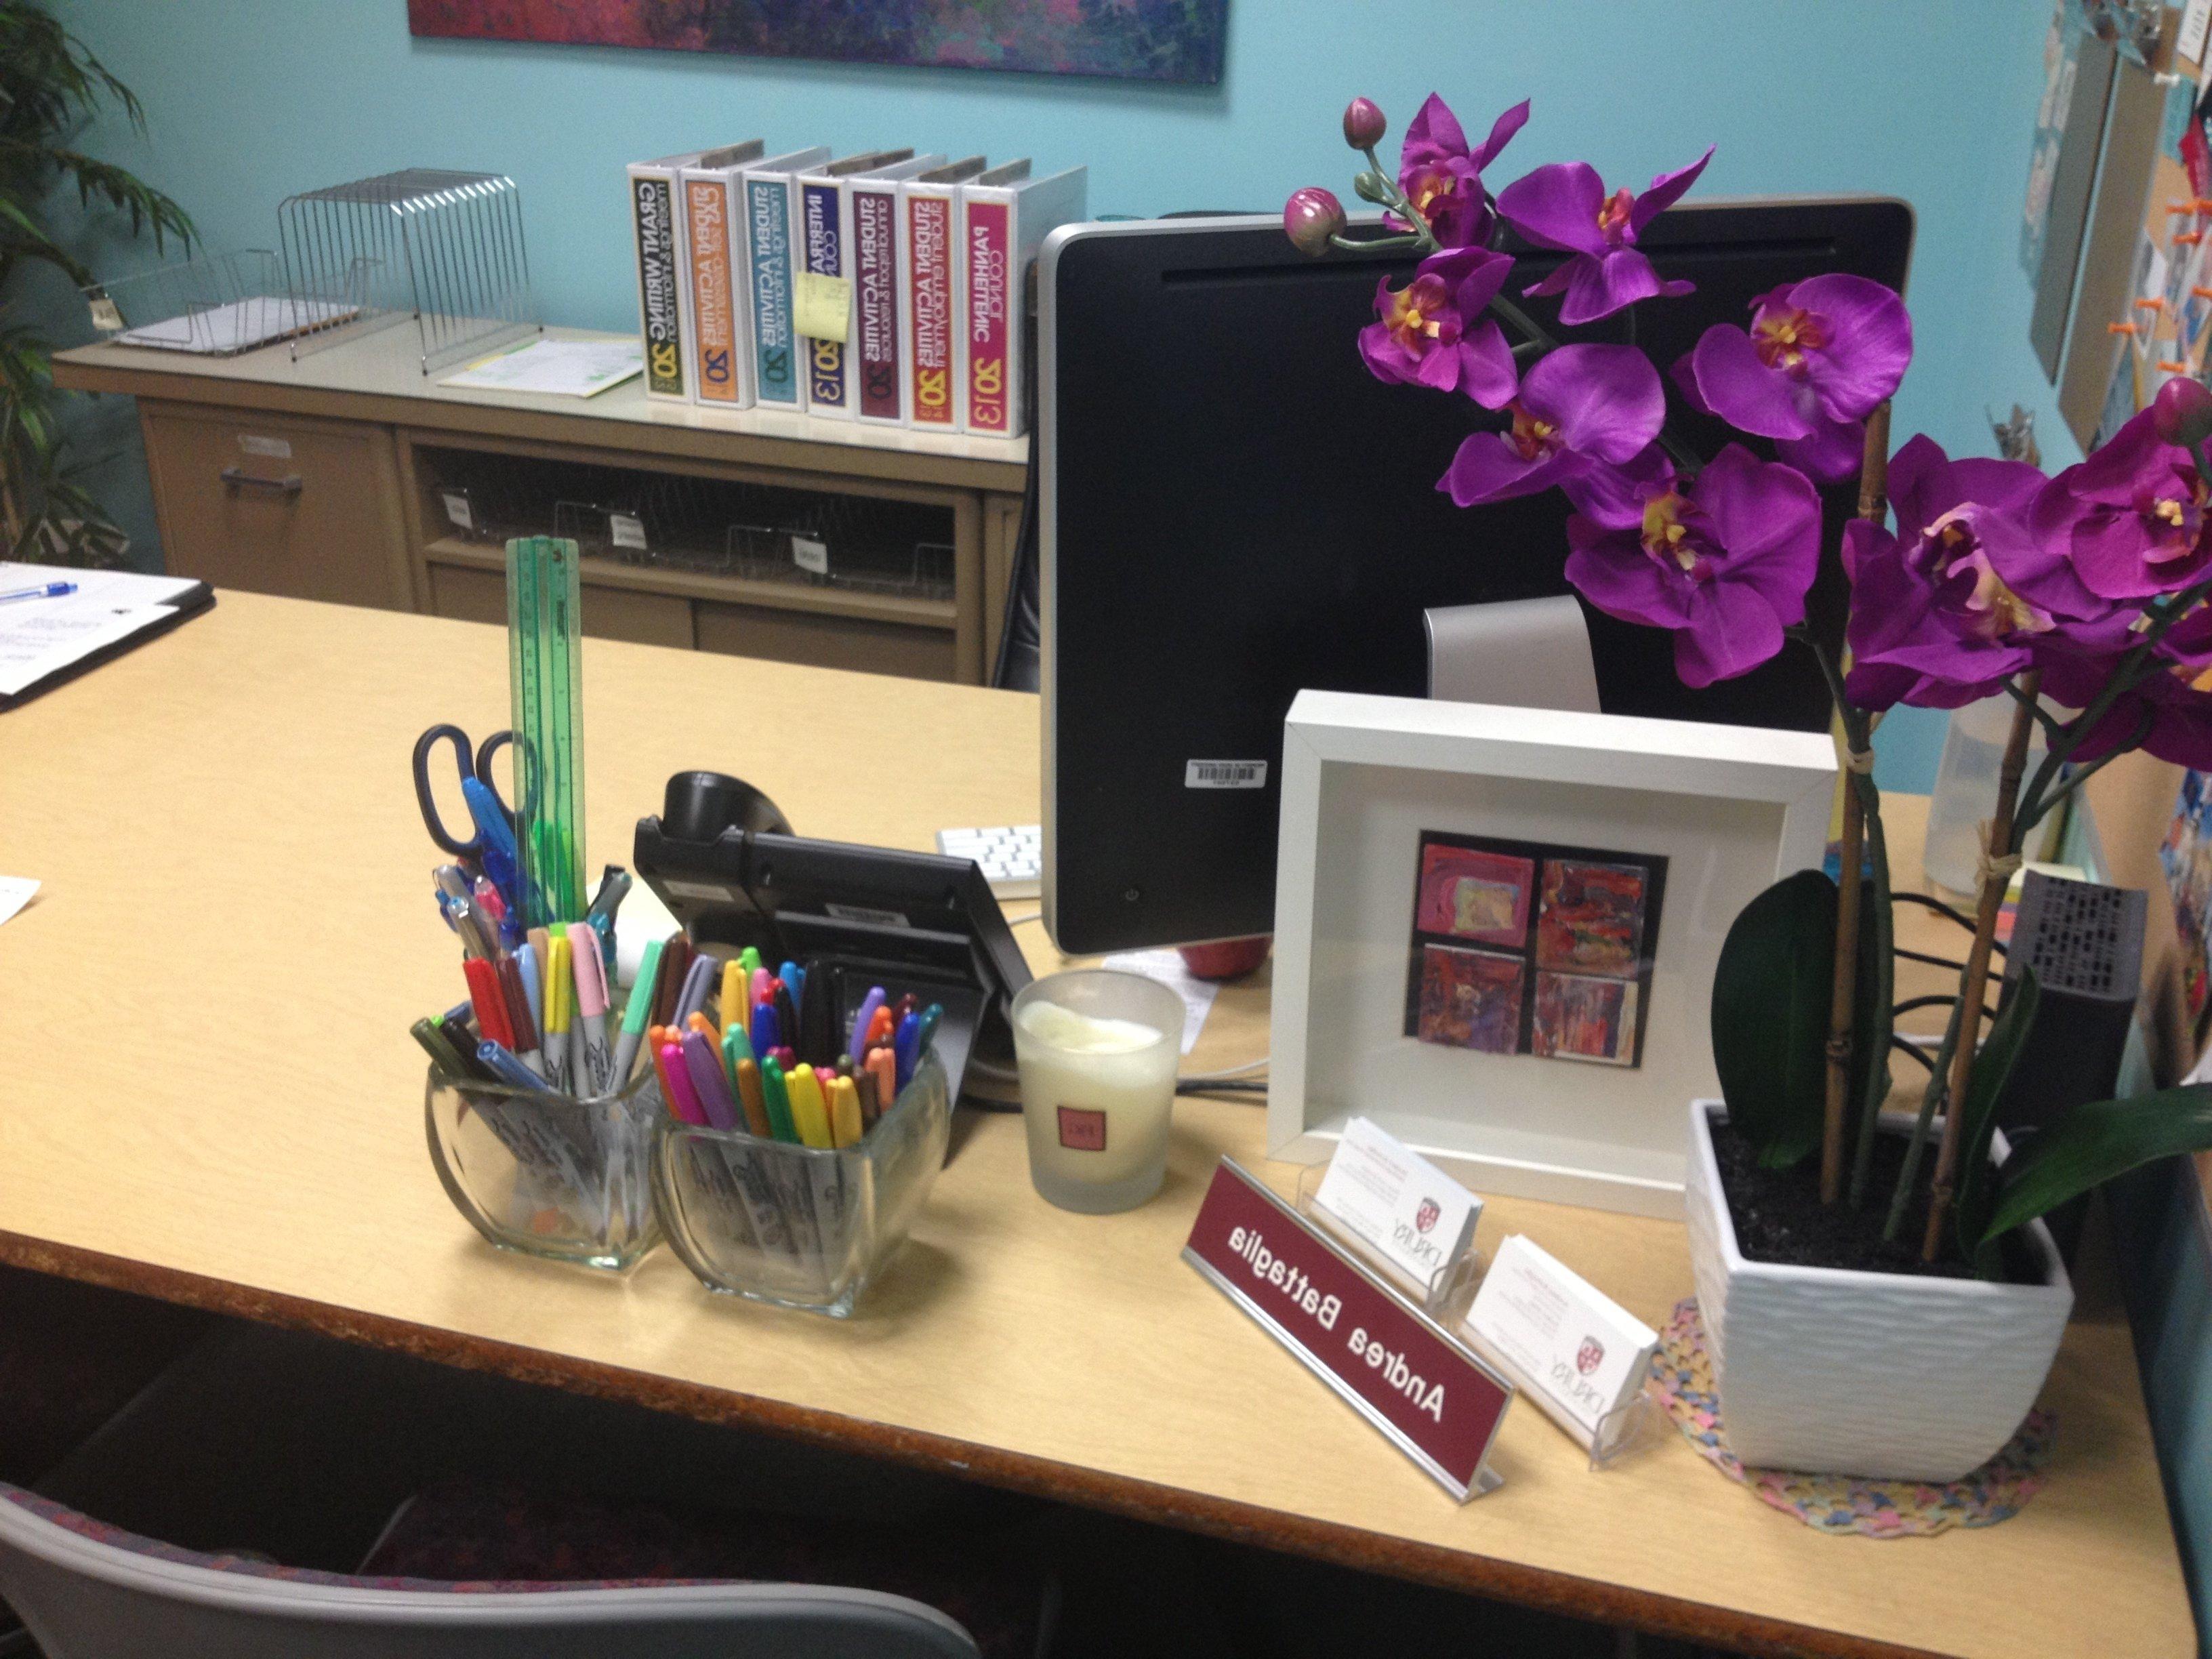 10 Unique Desk Decorating Ideas For Work office desk decorations best 25 work decor ideas on pinterest 2020